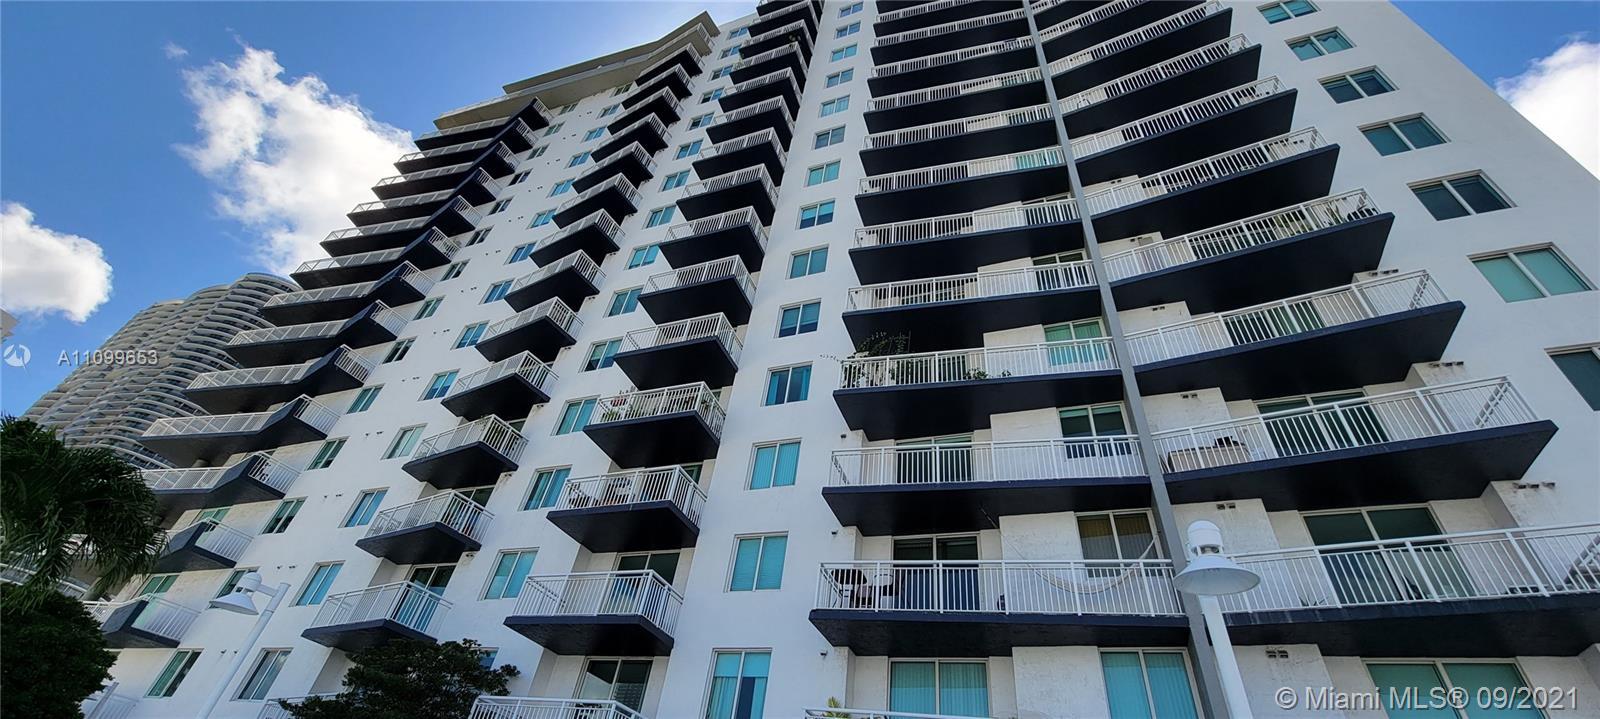 1800 Biscayne Plaza #501 - 275 NE 18th St #501, Miami, FL 33132